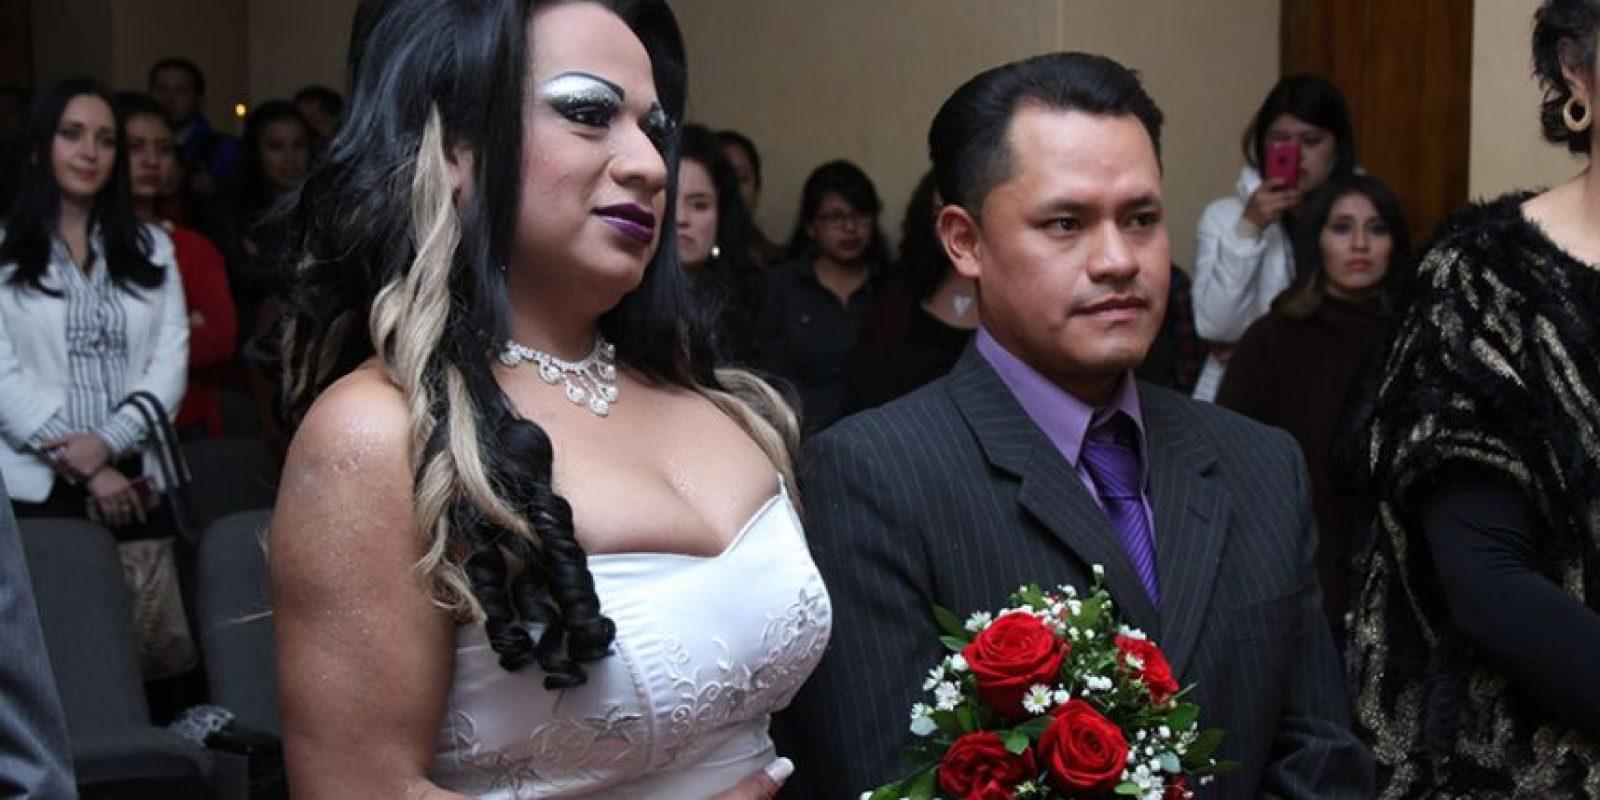 Matrimonio Simbolico Colombia : Primer matrimonio simbólico glbt se realizó en cuenca